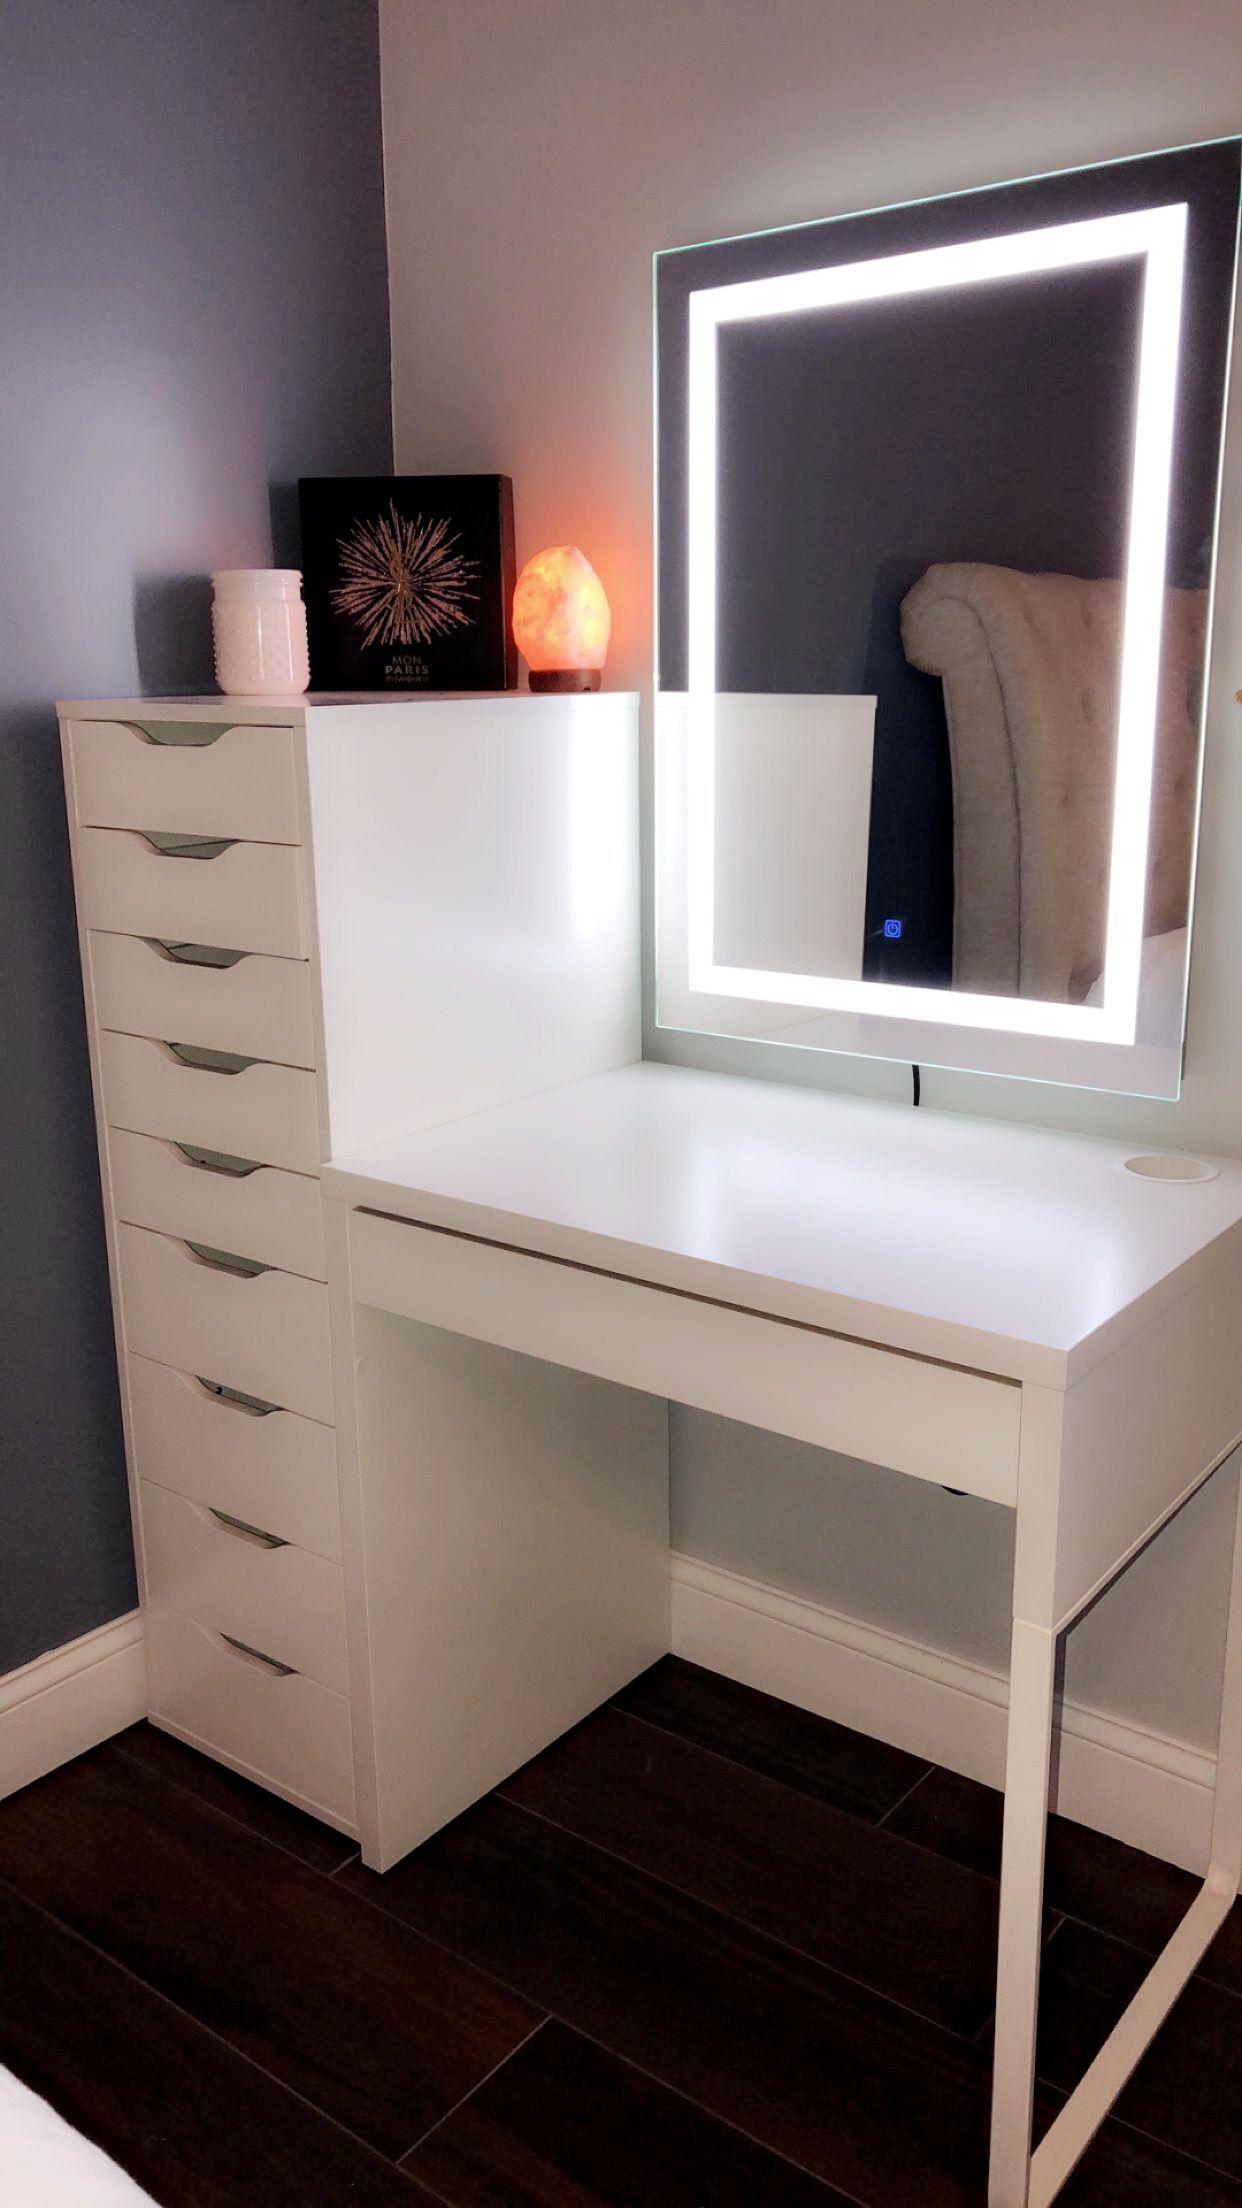 Makeup Vanity With Lighted Mirror Beauty Room Bedroom